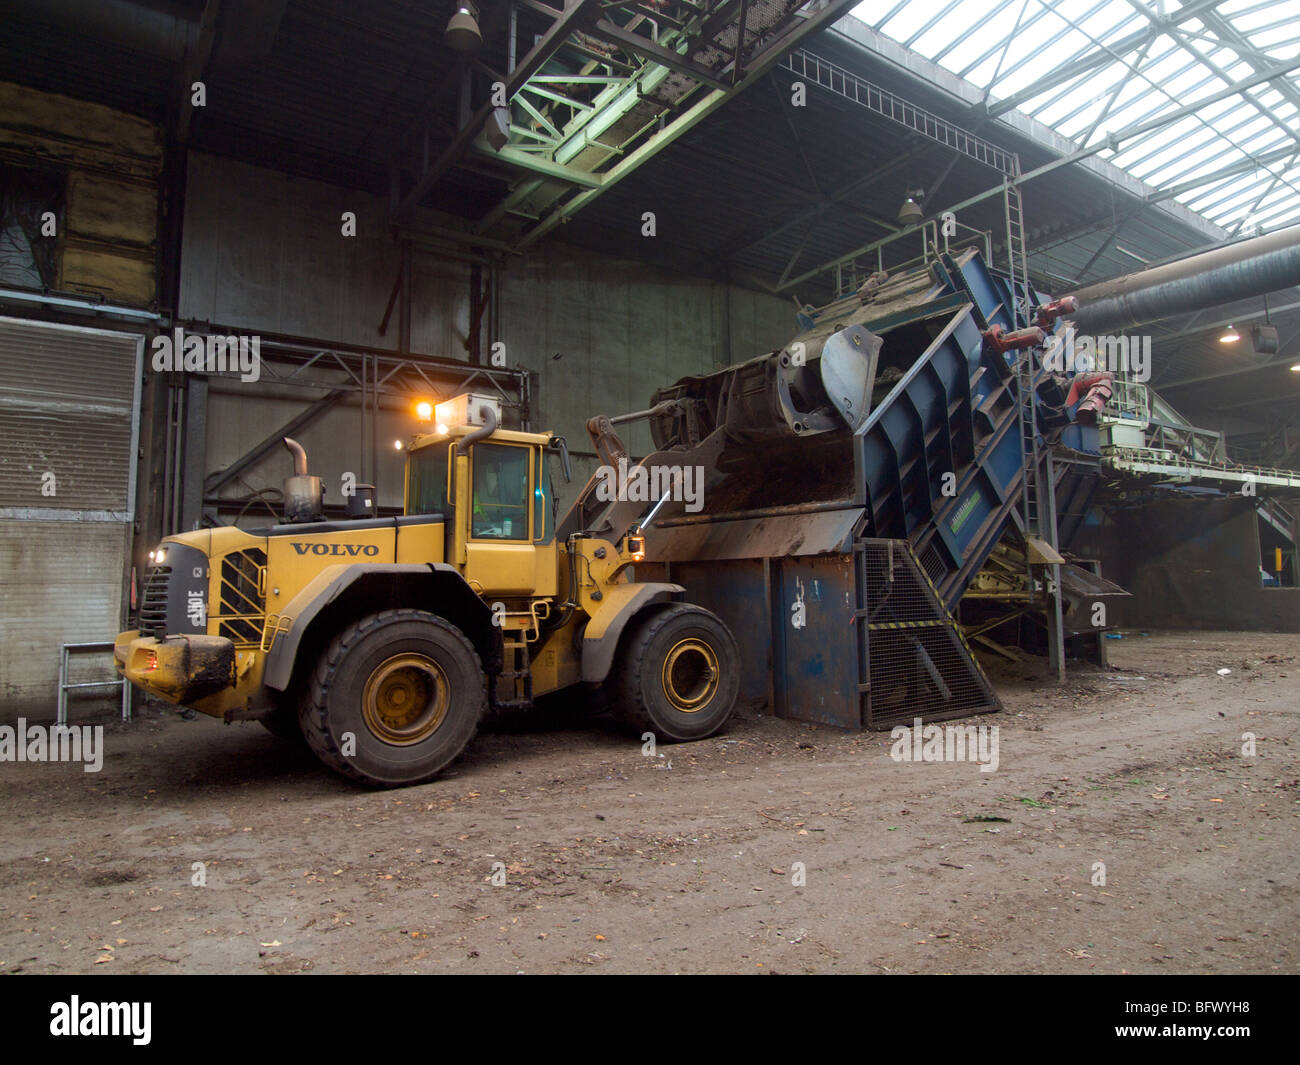 Large Volvo shovel dumping load of organic garbage into shredder at composting plant - Stock Image